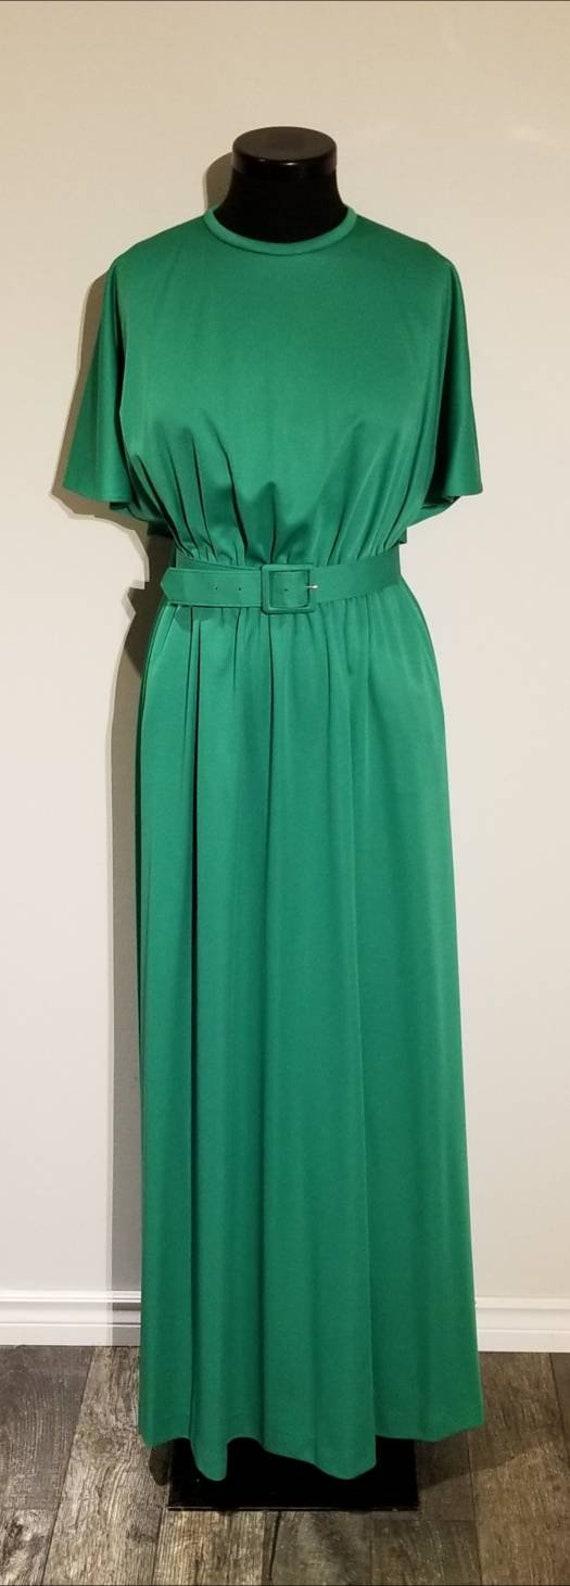 Vintage Maxi Dress   1970's Dress   Mod   Caped  